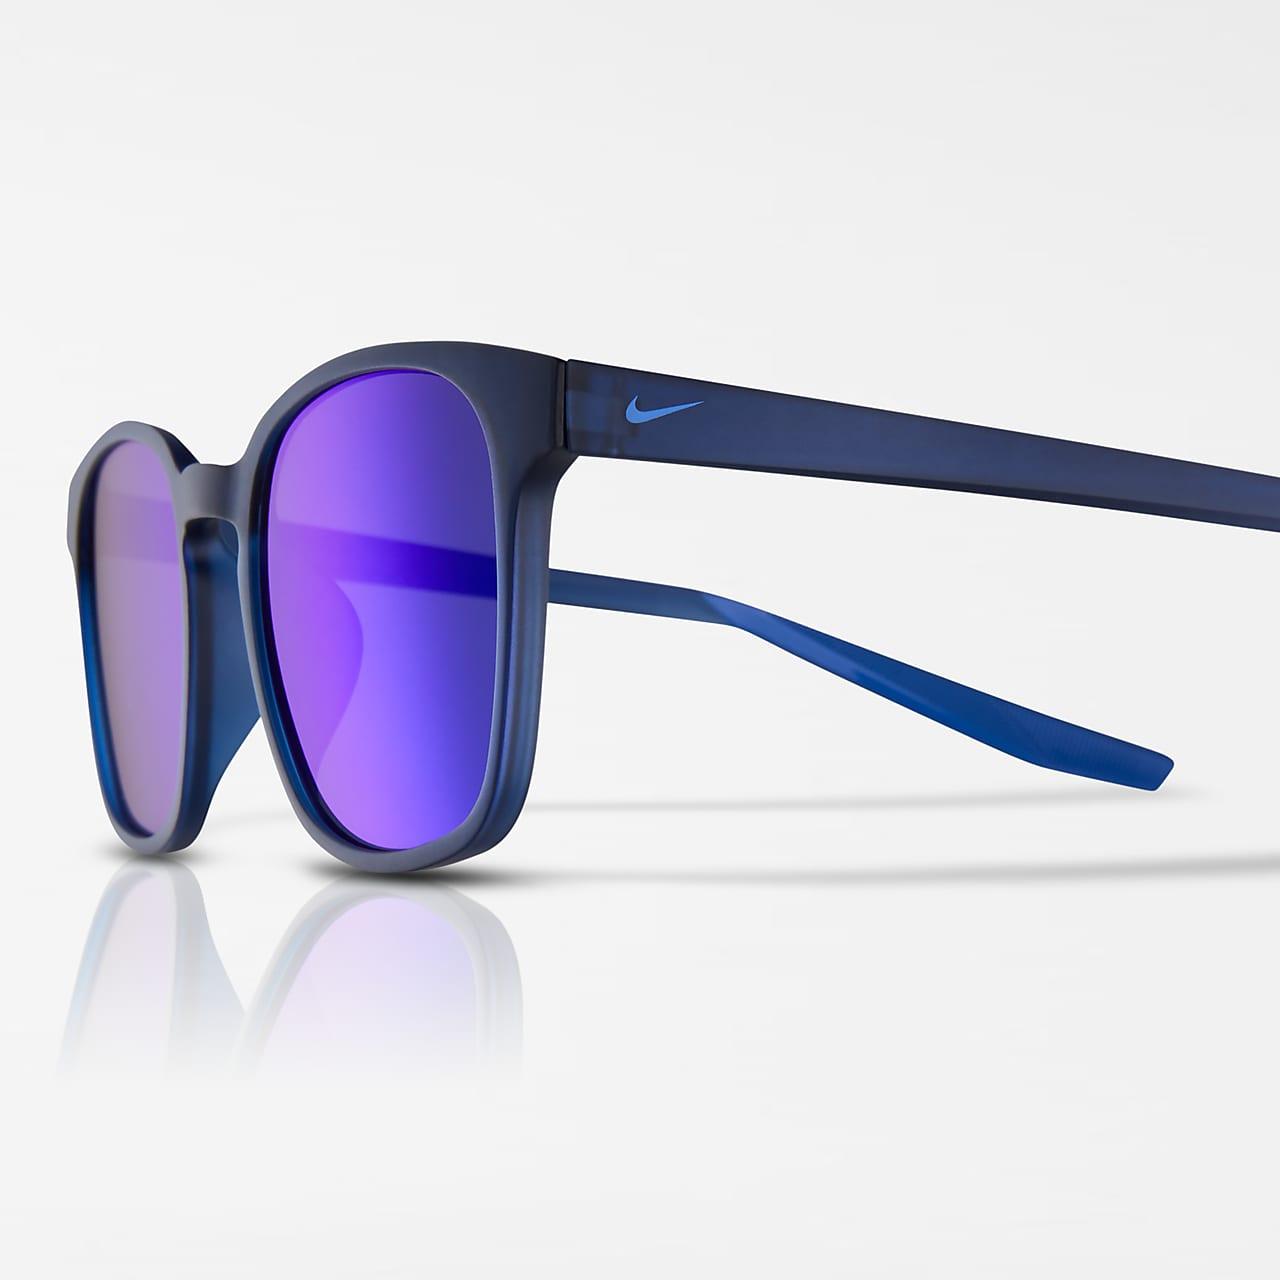 Nike Session Mirrored Sunglasses